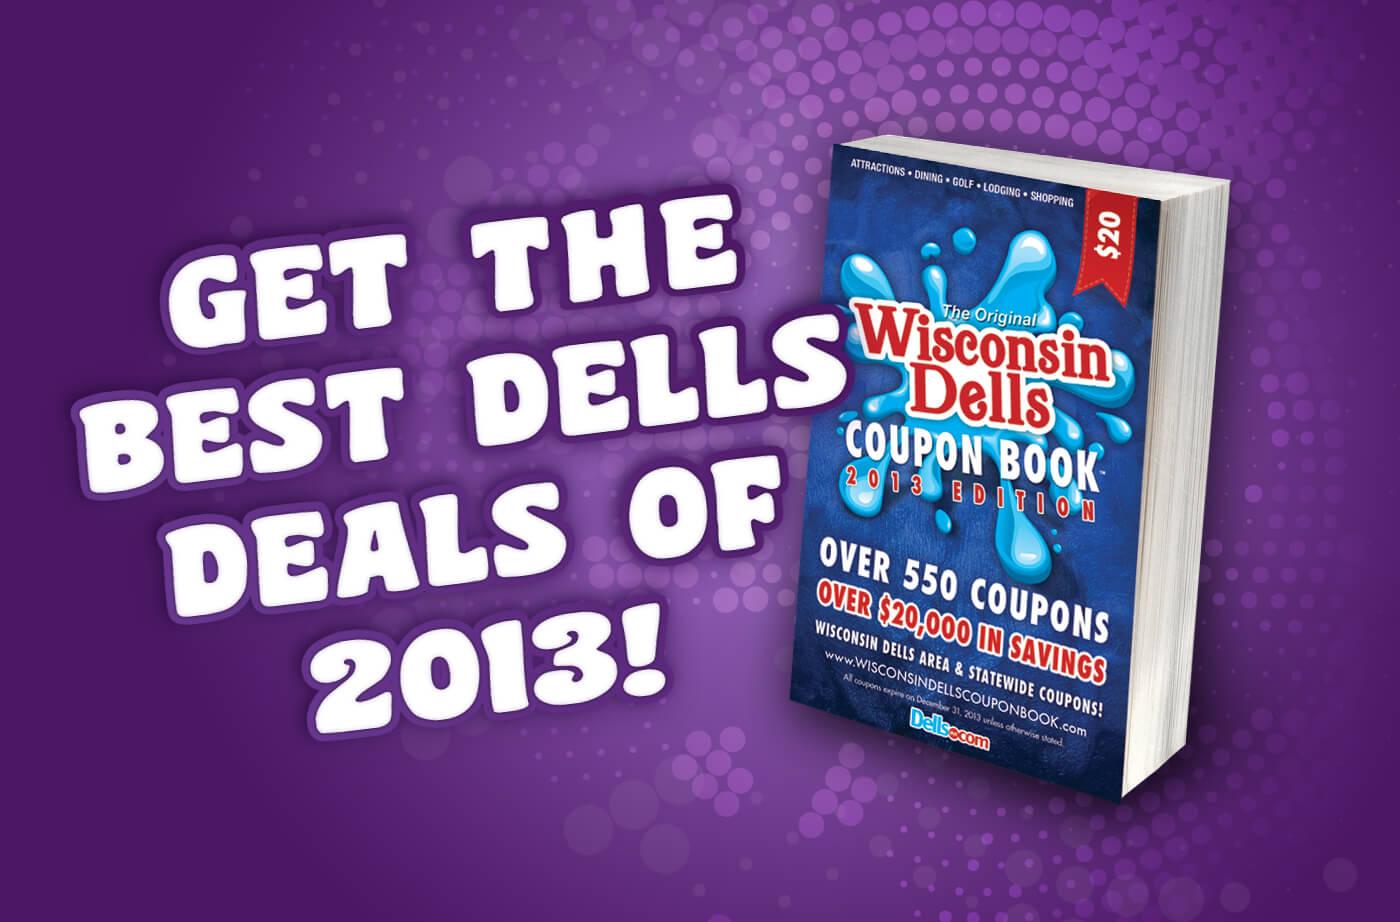 Restaurant discount coupons for wisconsin dells